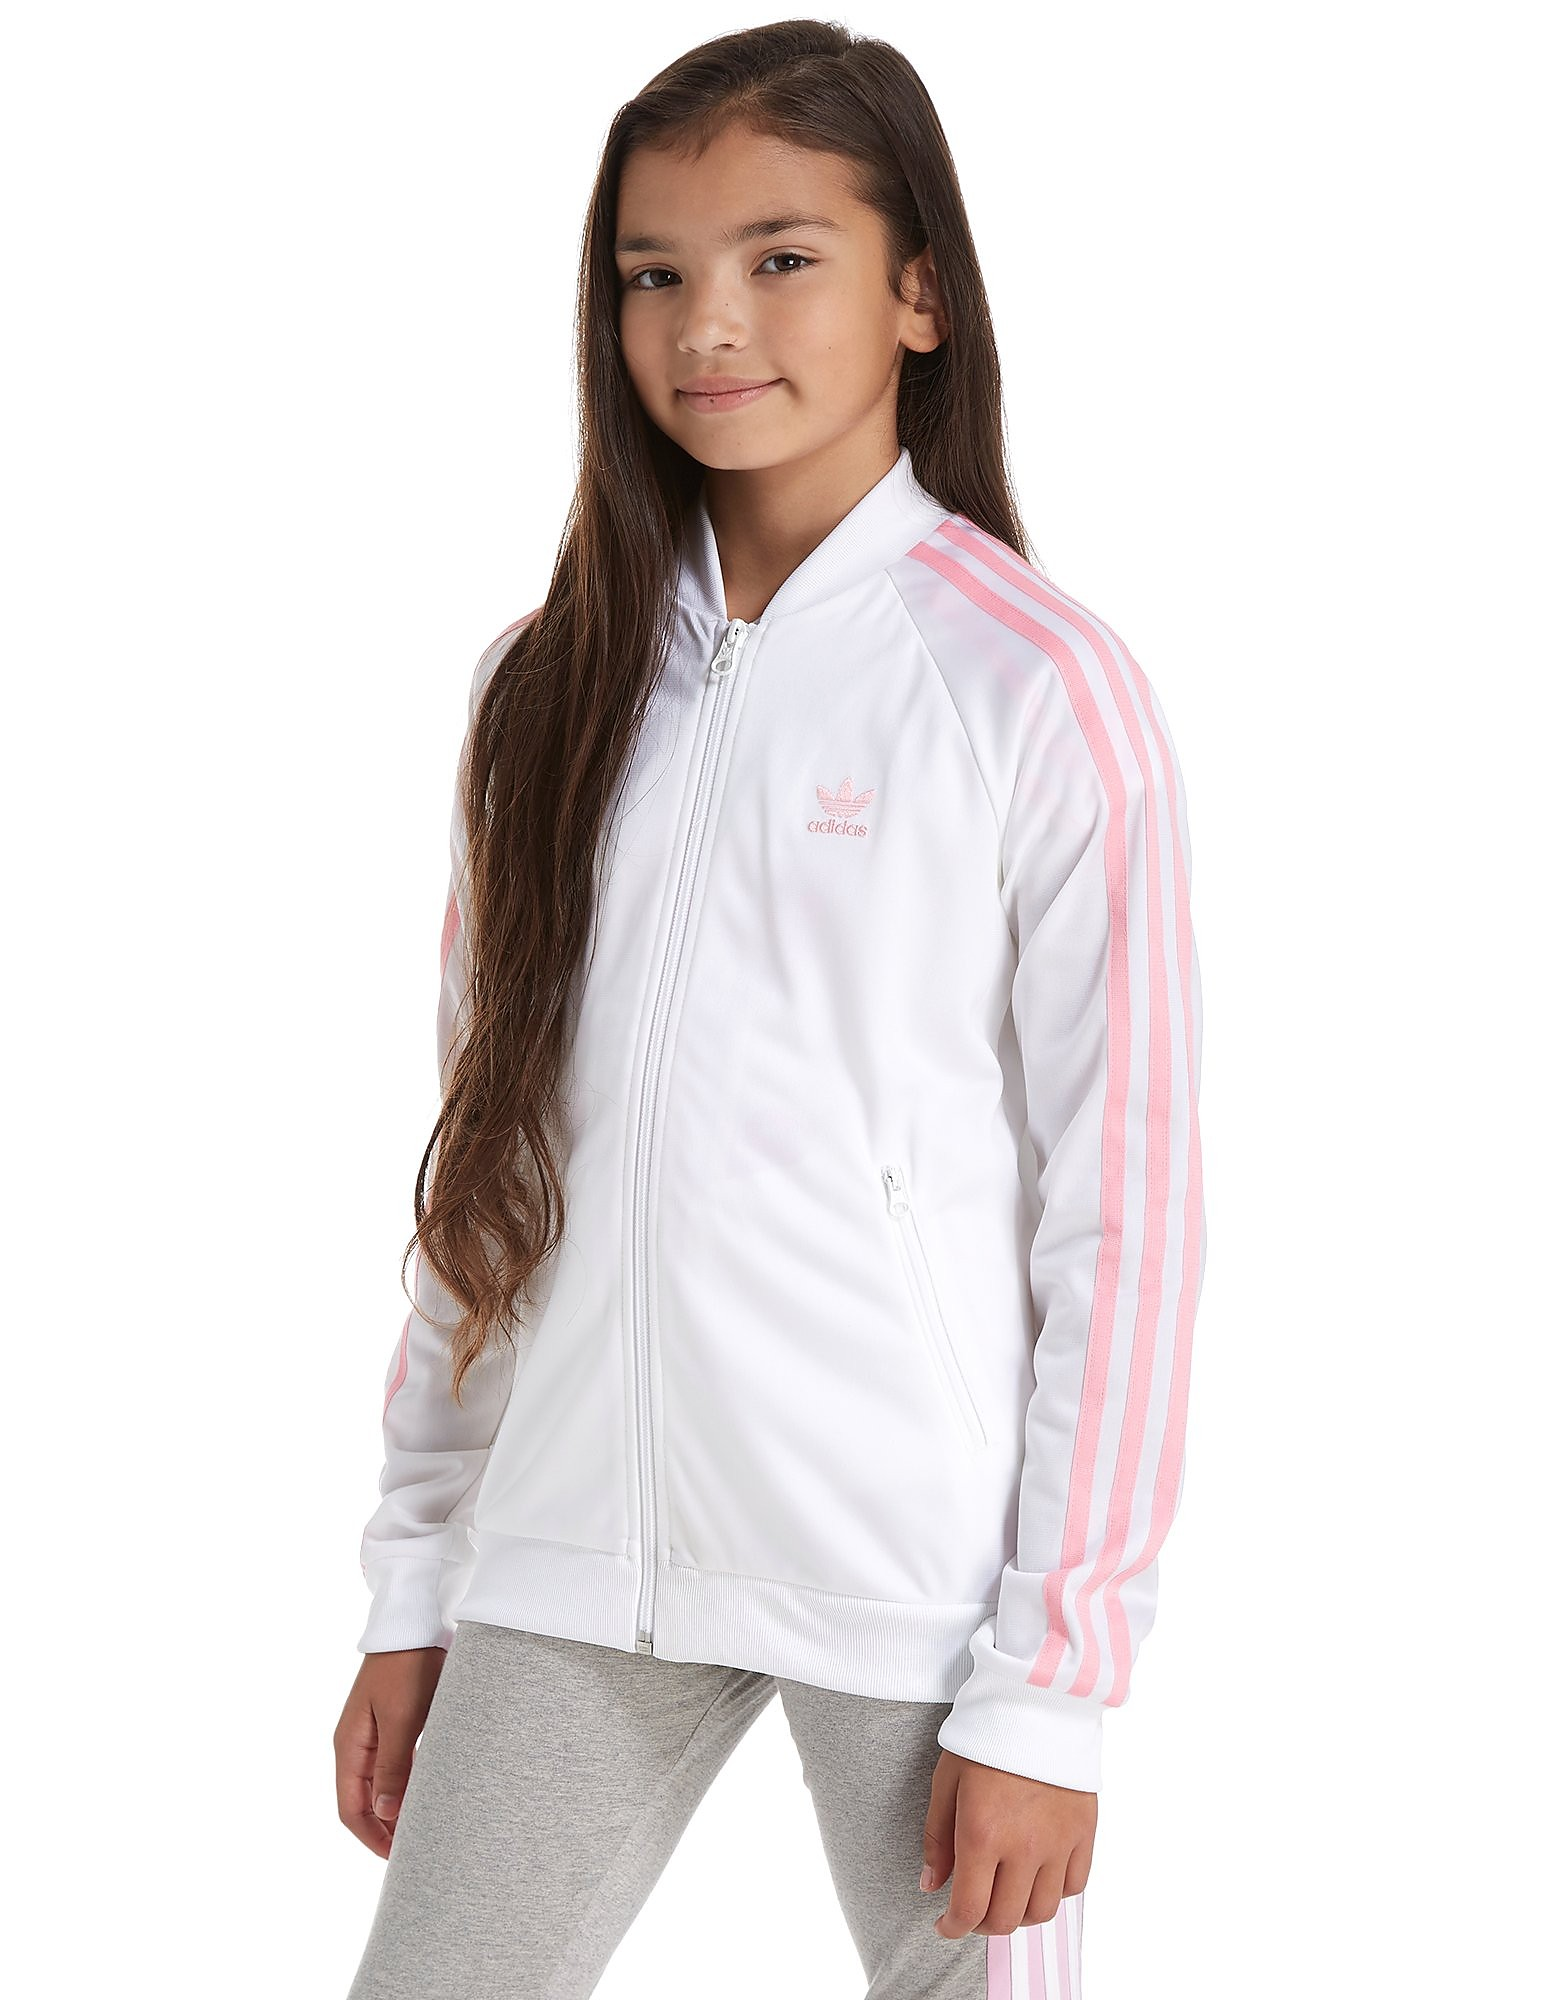 adidas Originals Girls Superstar Track Top Junior